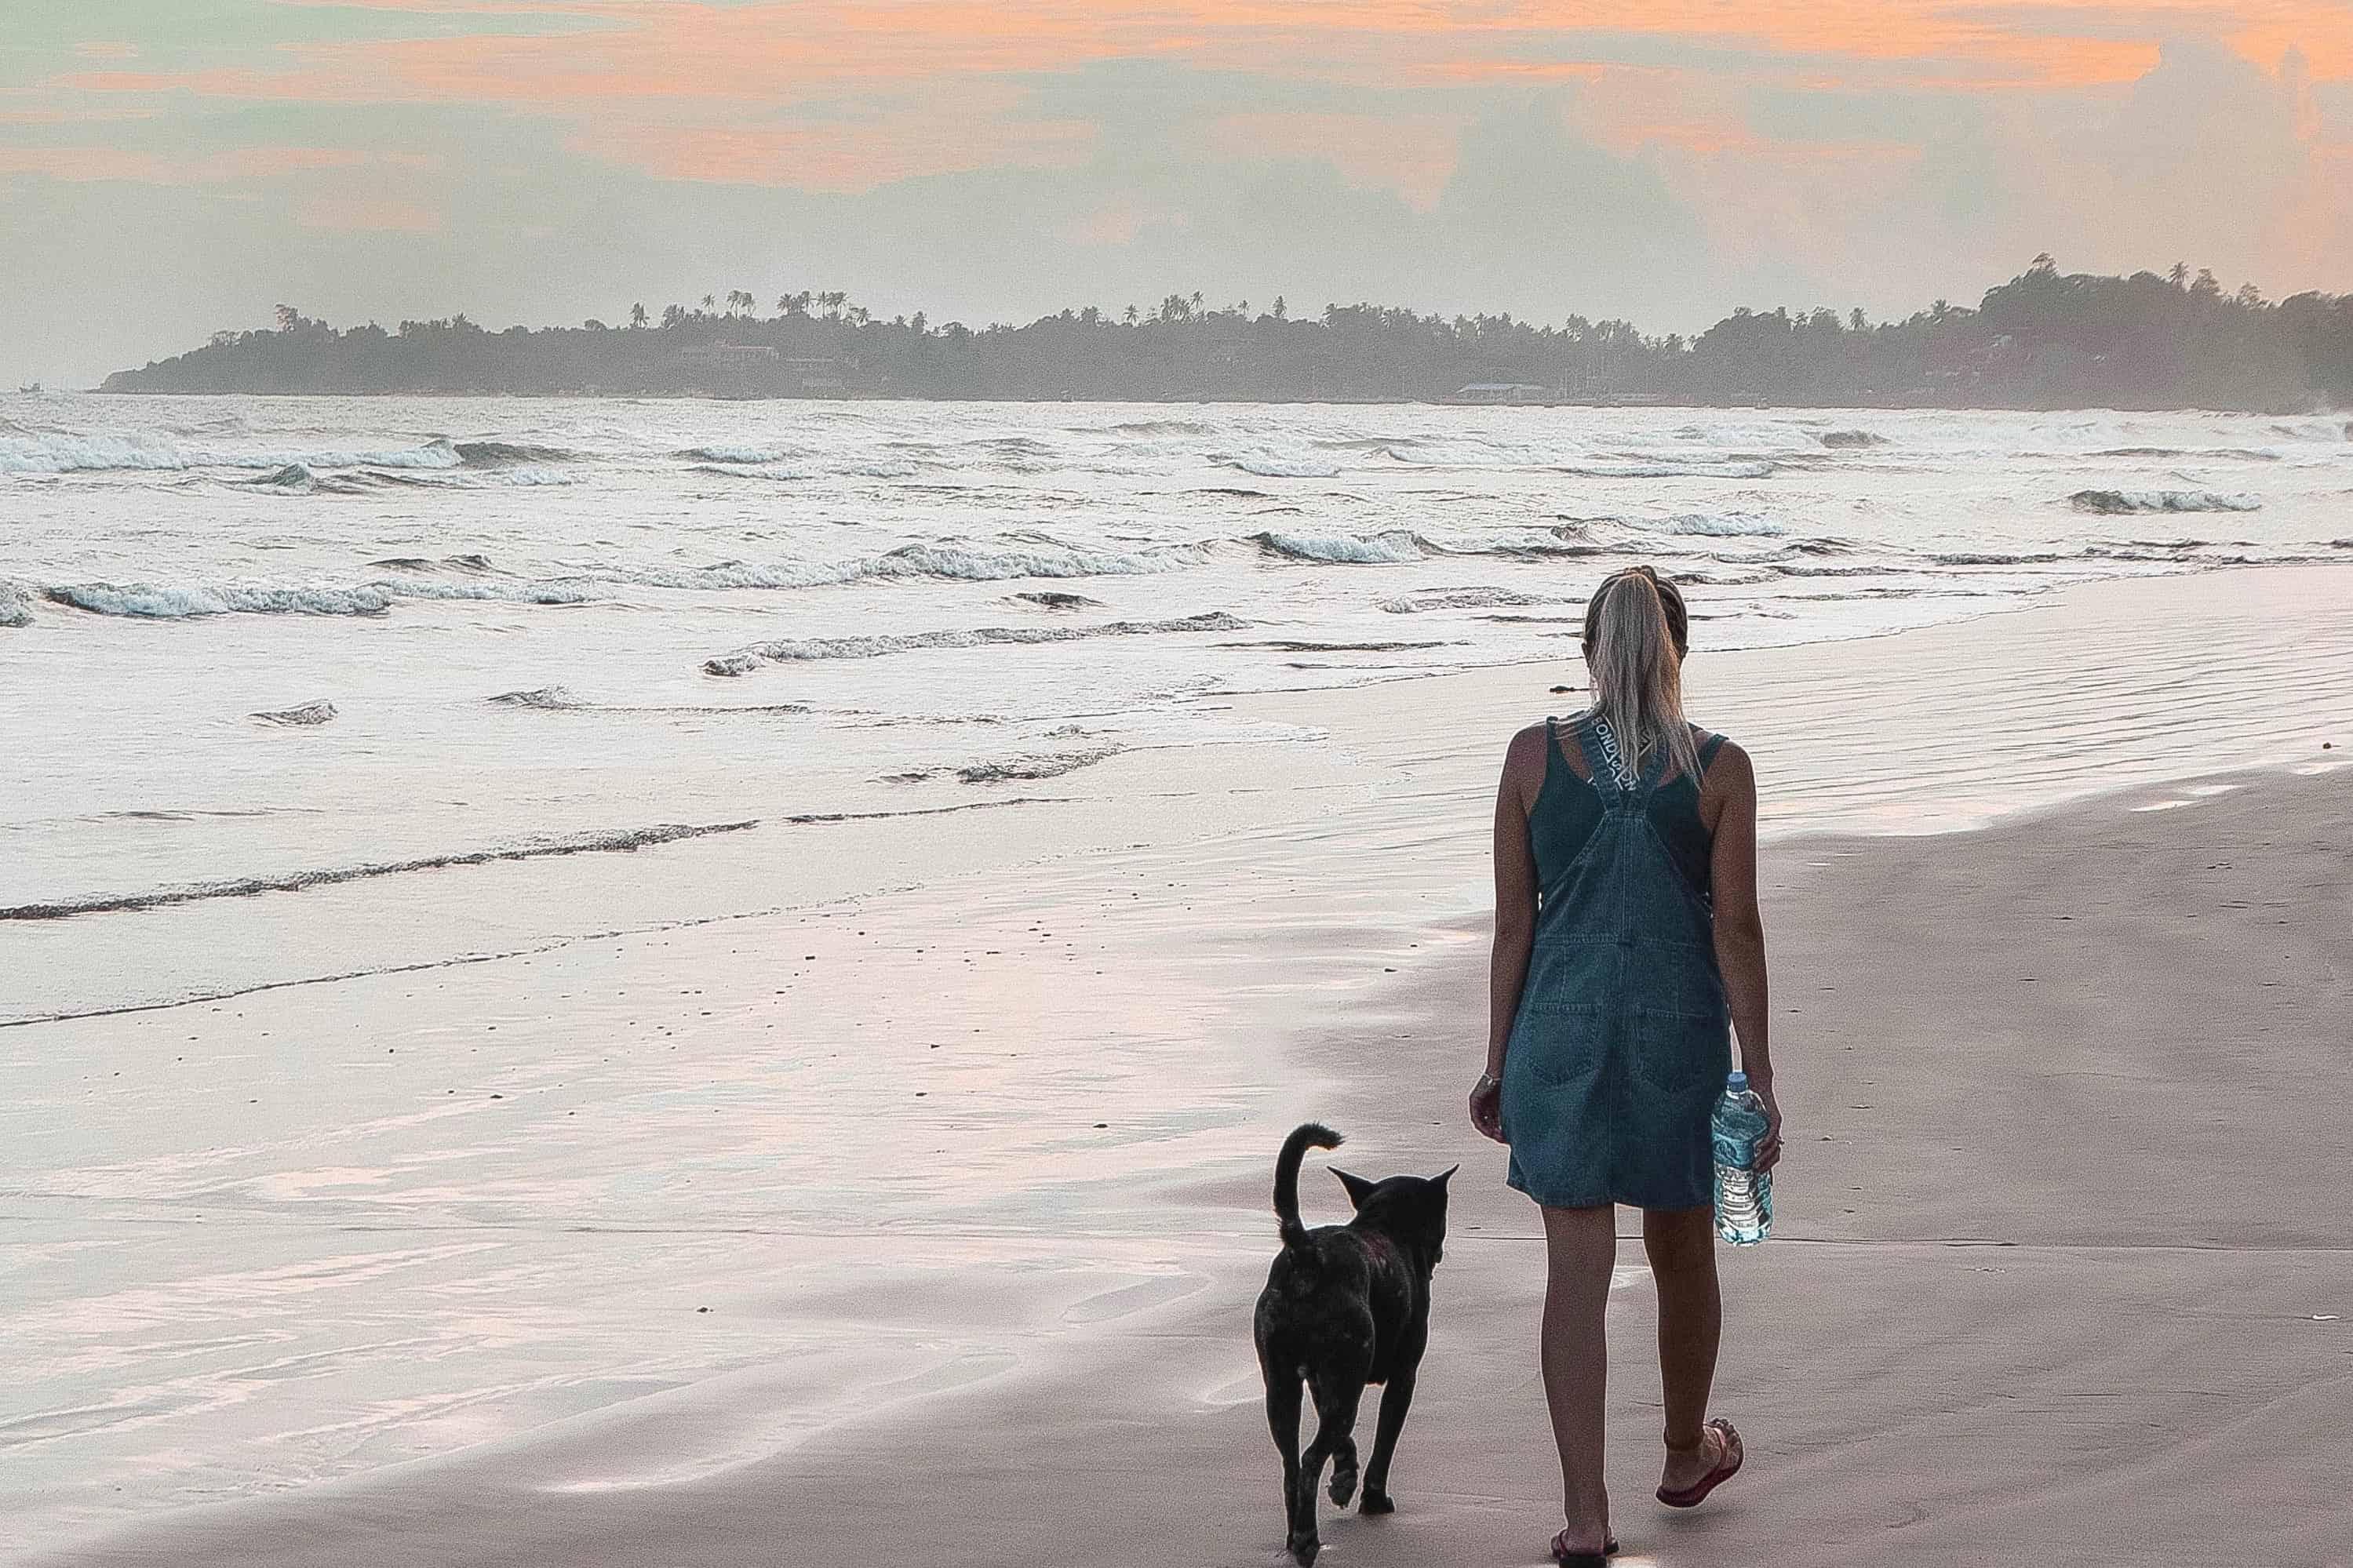 Wanderers & Warriors - Charlie & Lauren UK Travel Couple - Best Surf Spots In Sri Lanka Surf Spots - Weligama Beach